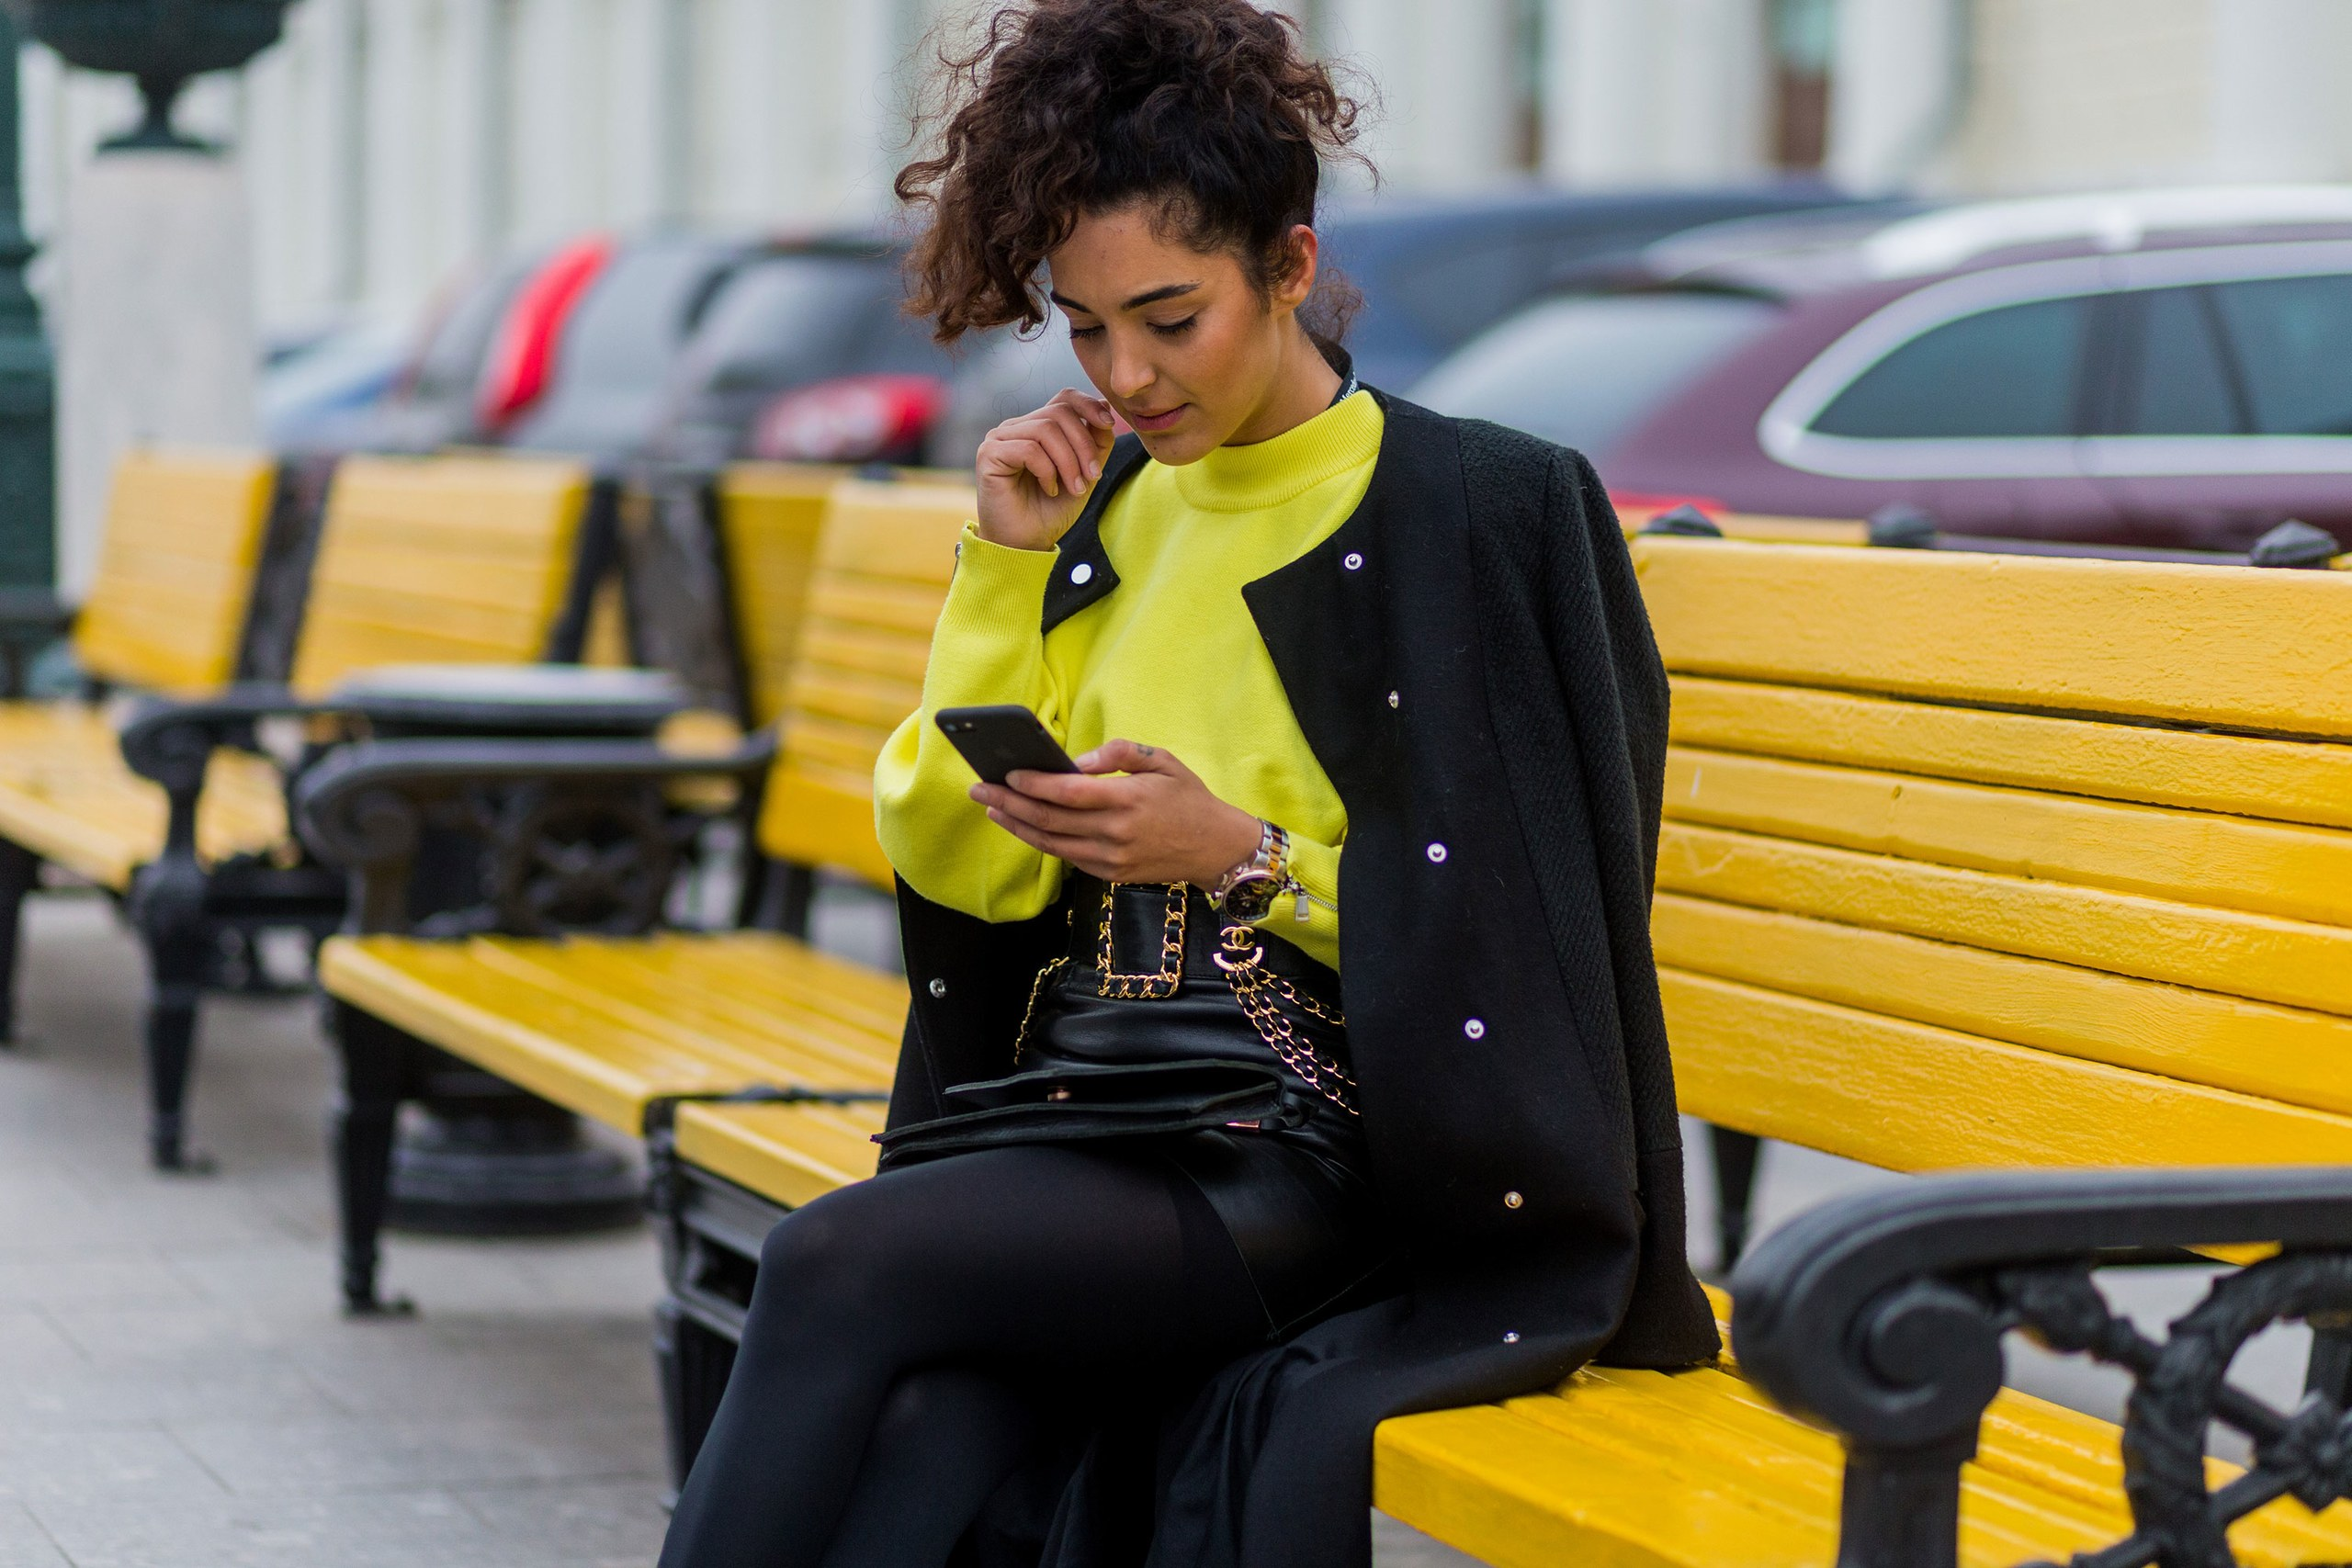 Guadagna facendo l'influencer su Instagram: 11 consigli indispensabili!